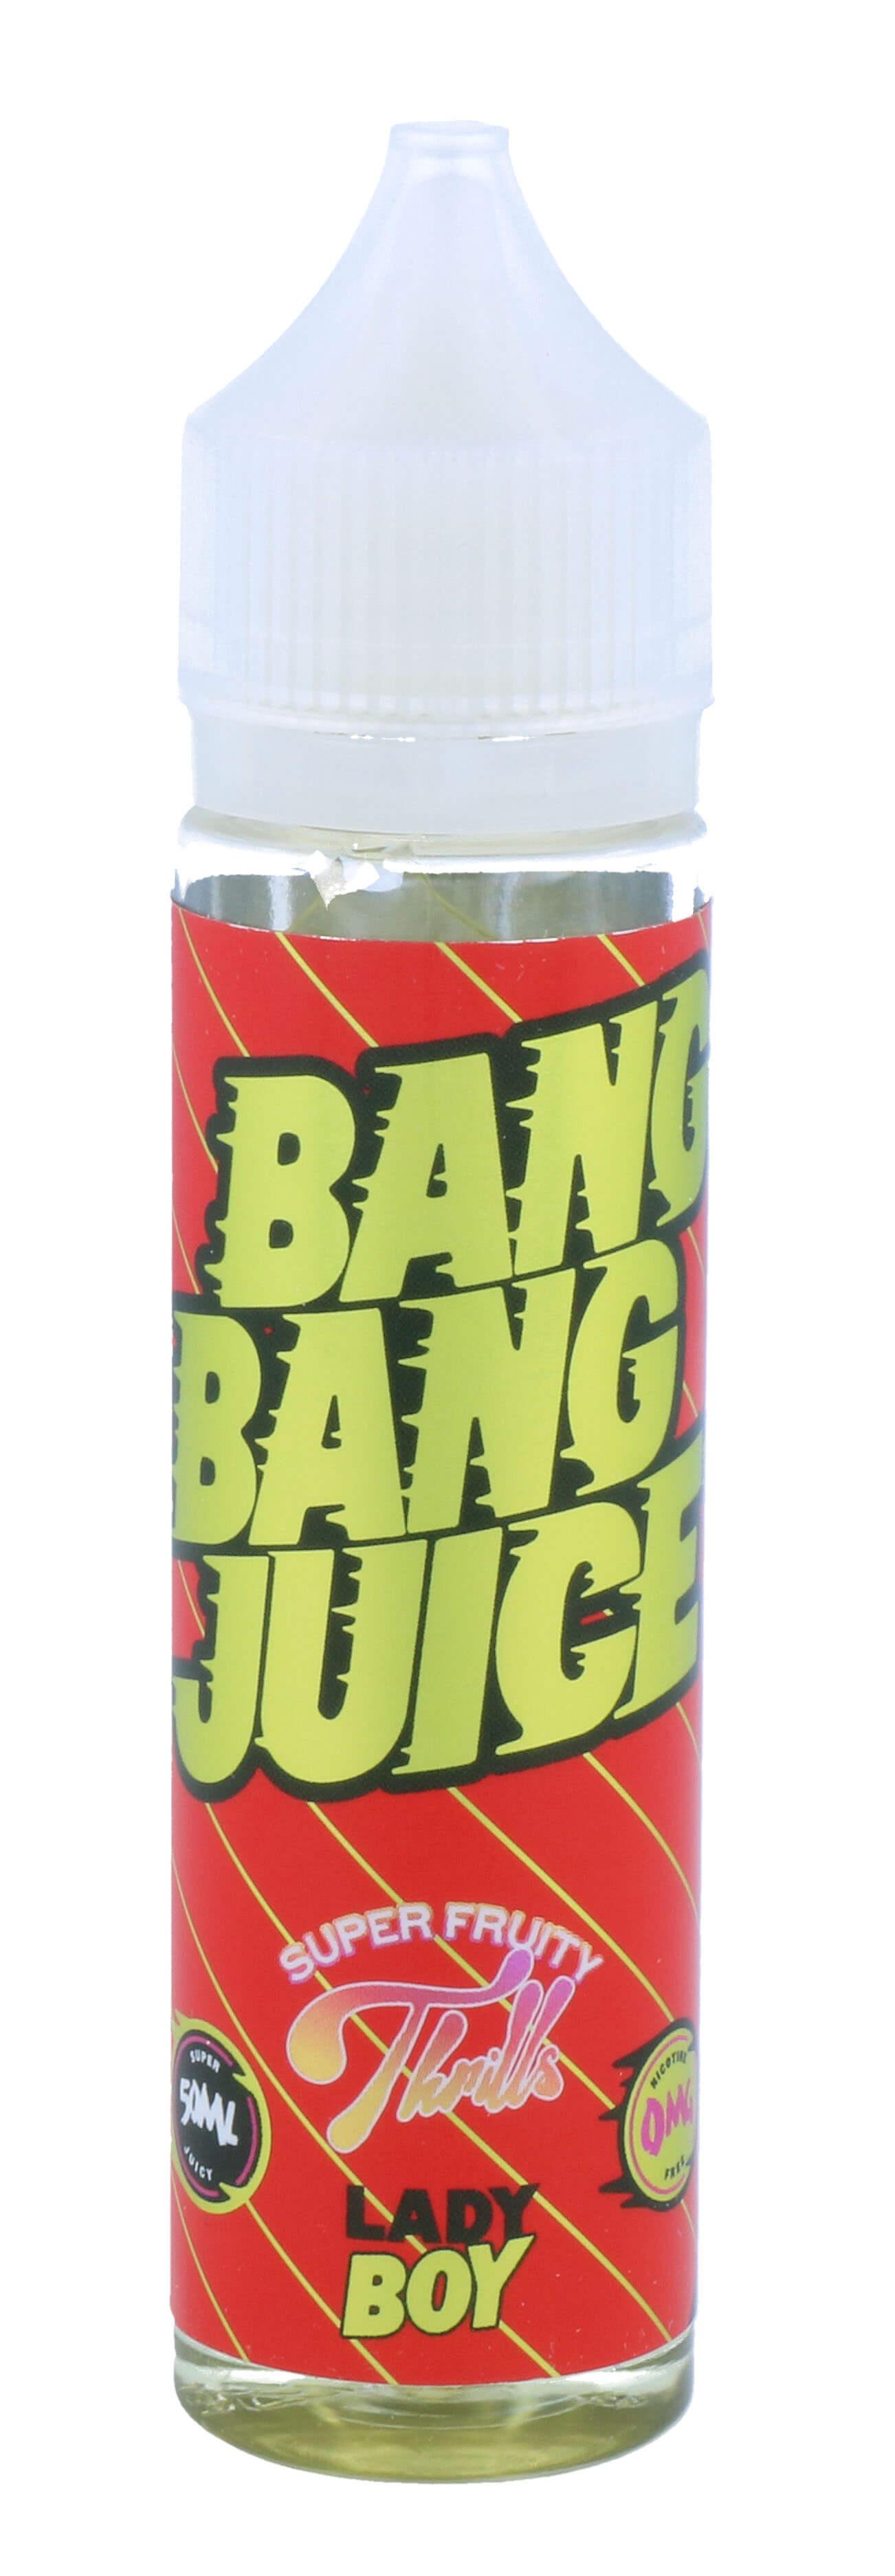 Bang Bang Juice - Ladyboy - 50ml - 0mg/ml